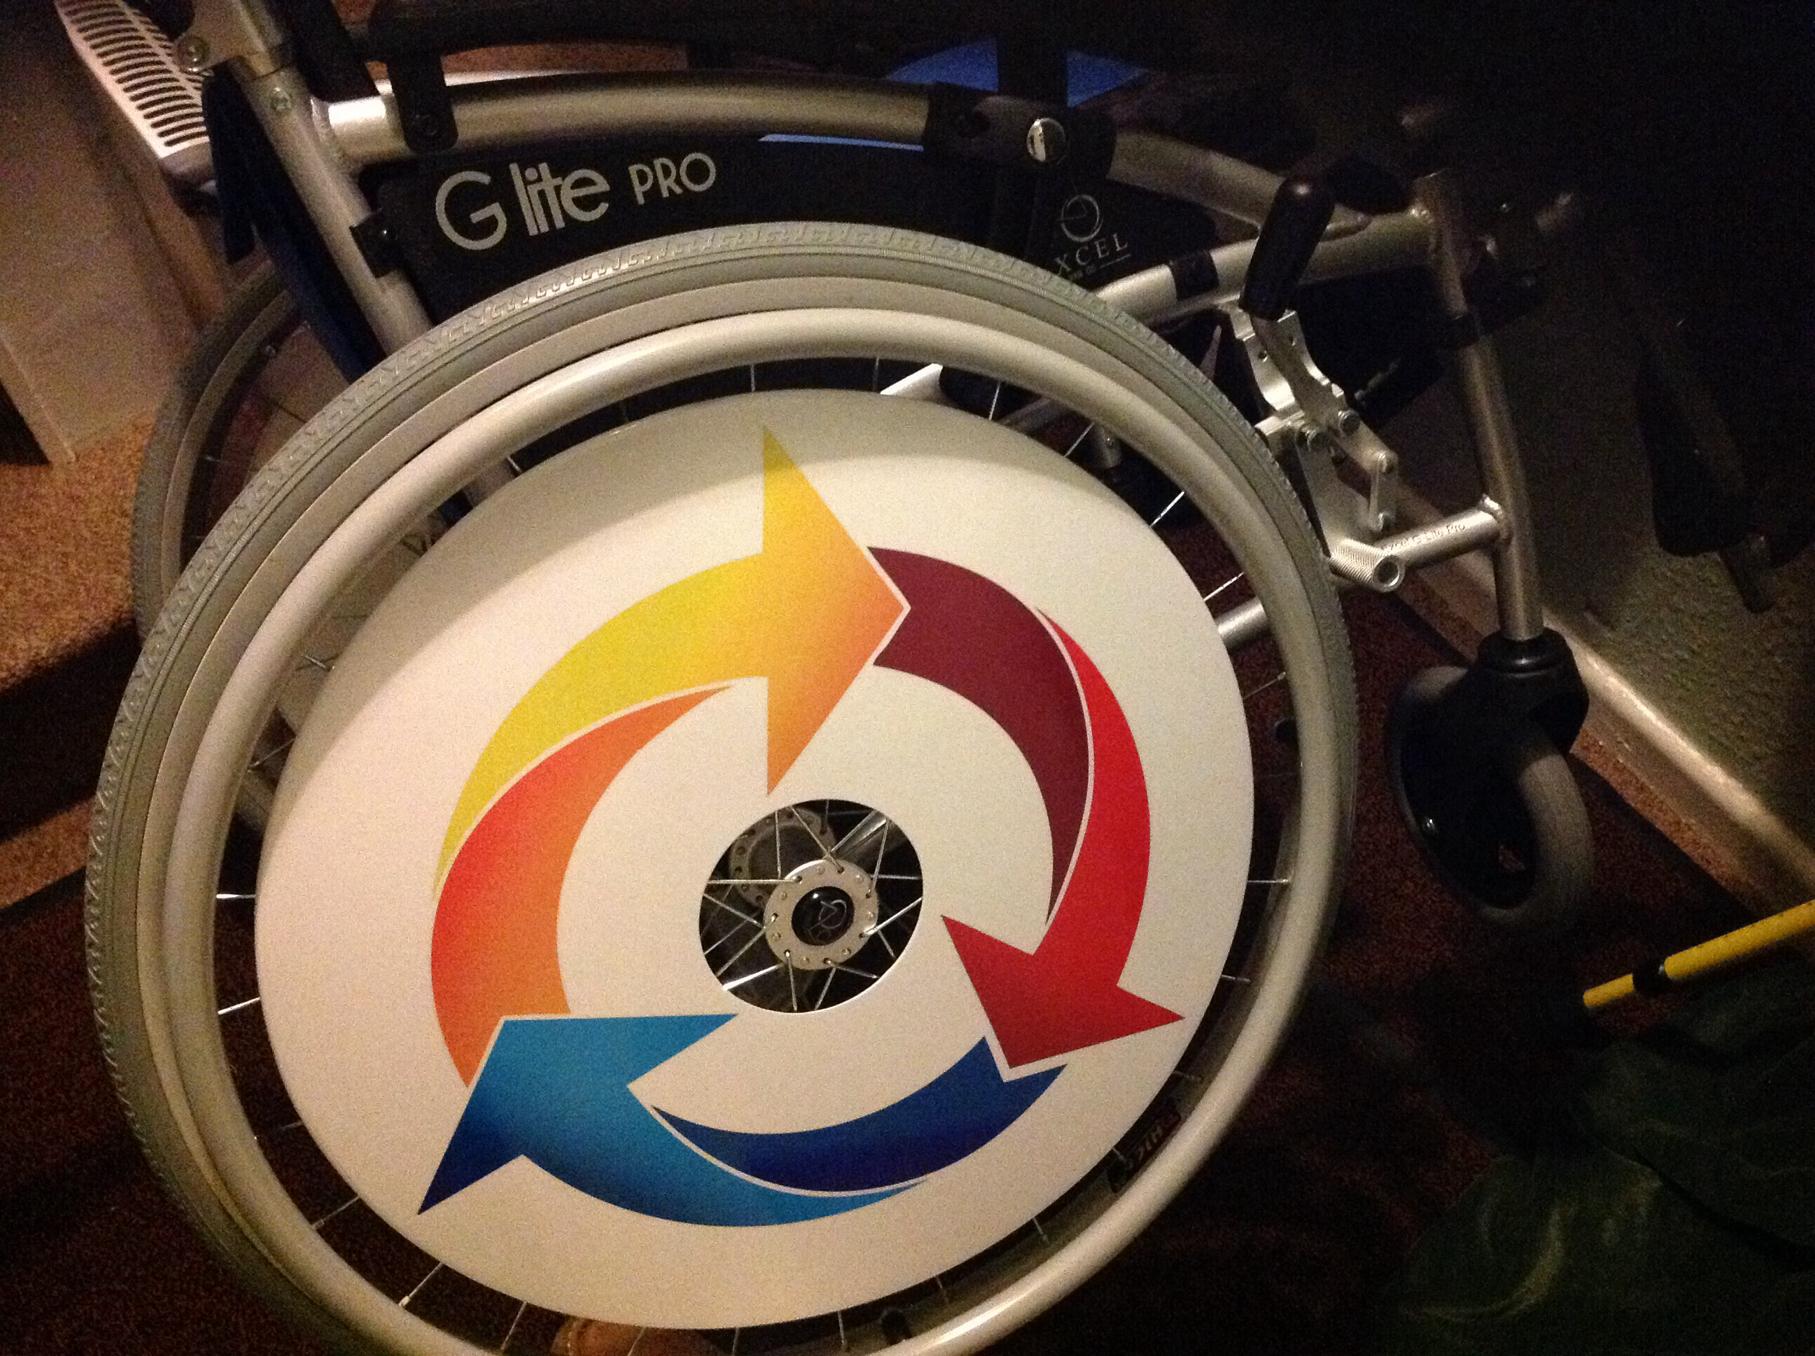 Arrow Wheelchair Wheel Covers SpokeGuards